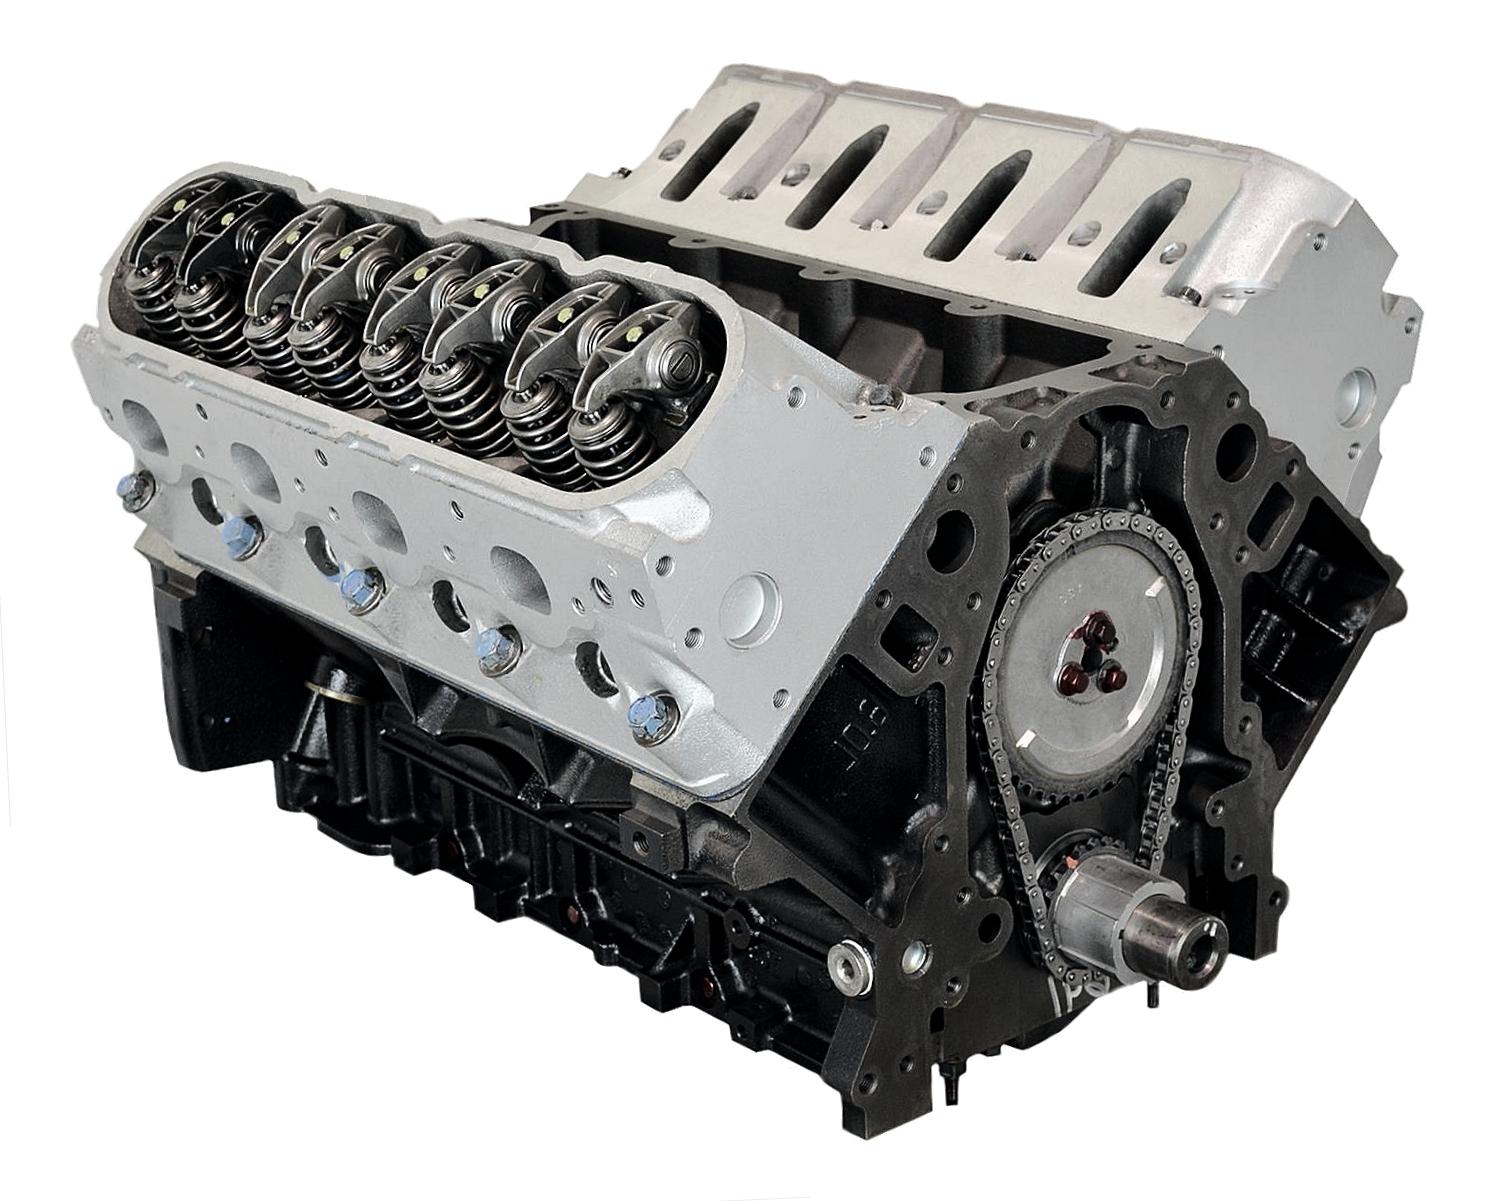 5.3 GM L59 Reman Long Block Engine GMC Sierra 1500 Vin Code: T